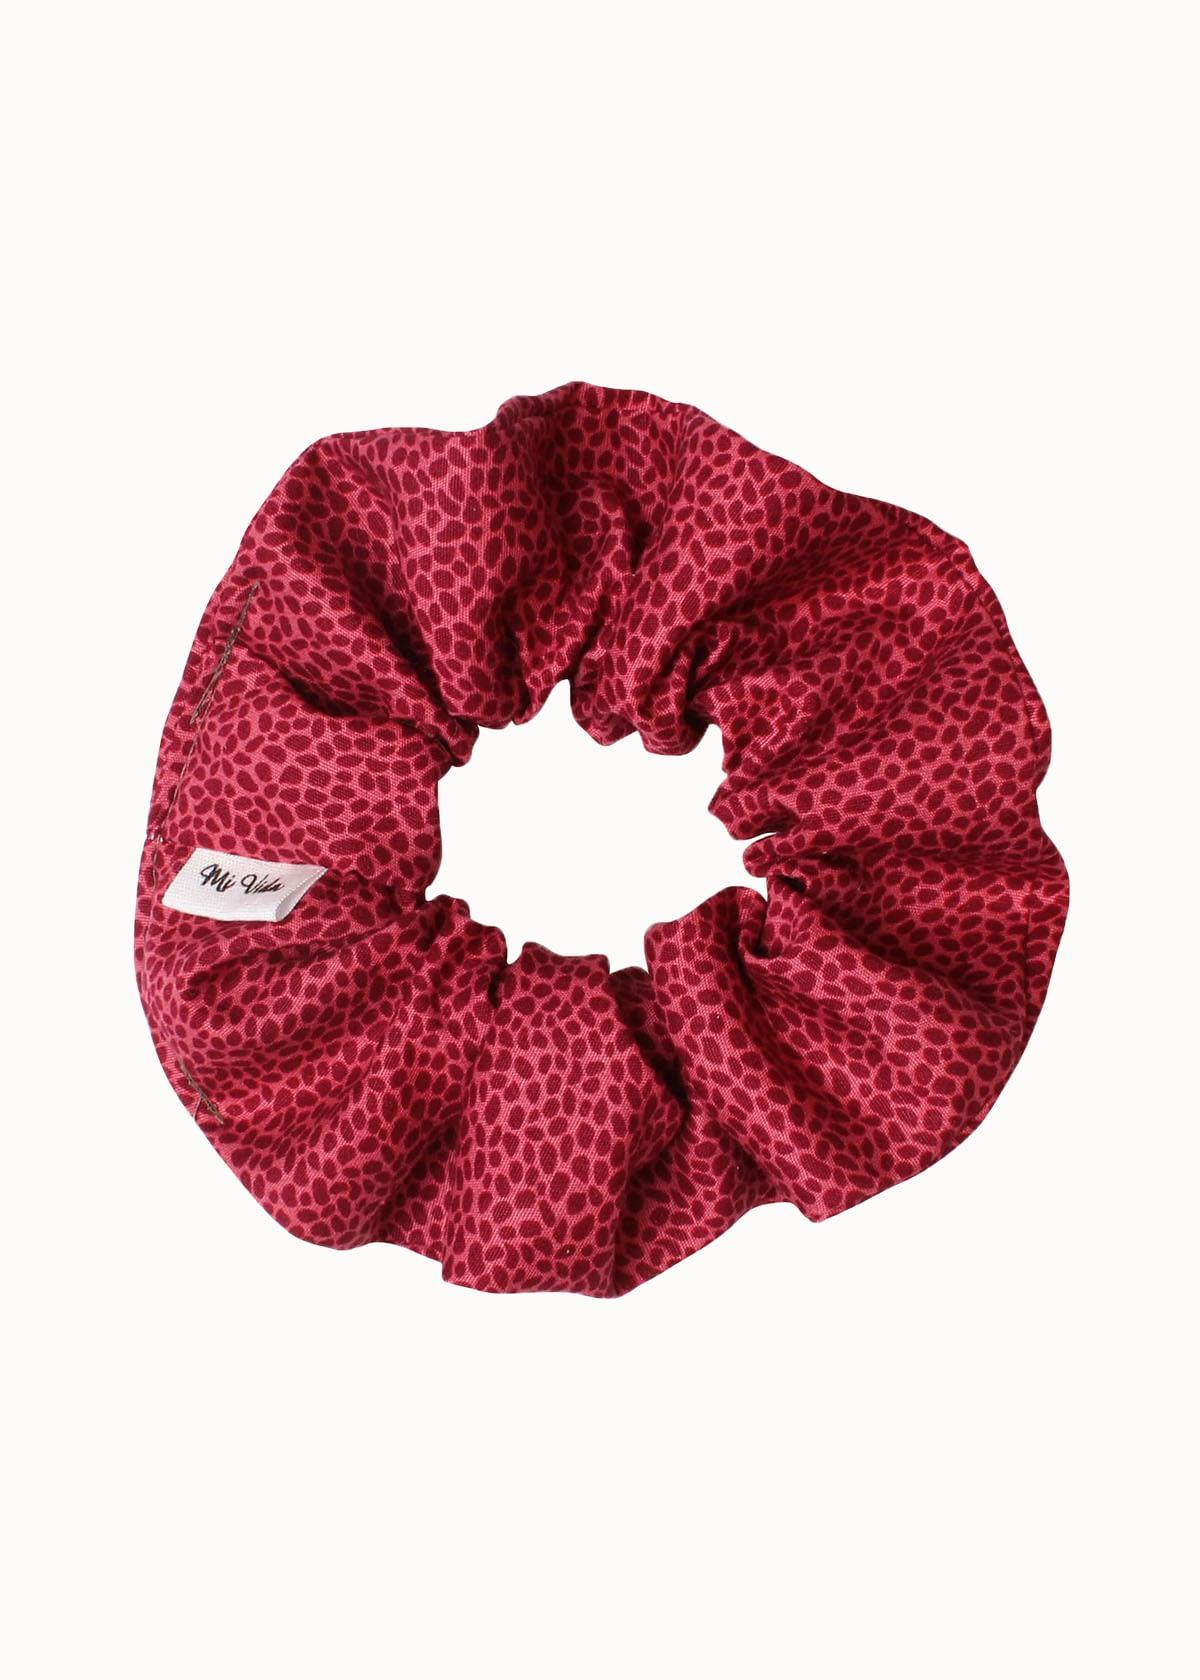 Luipaard print scrunchie